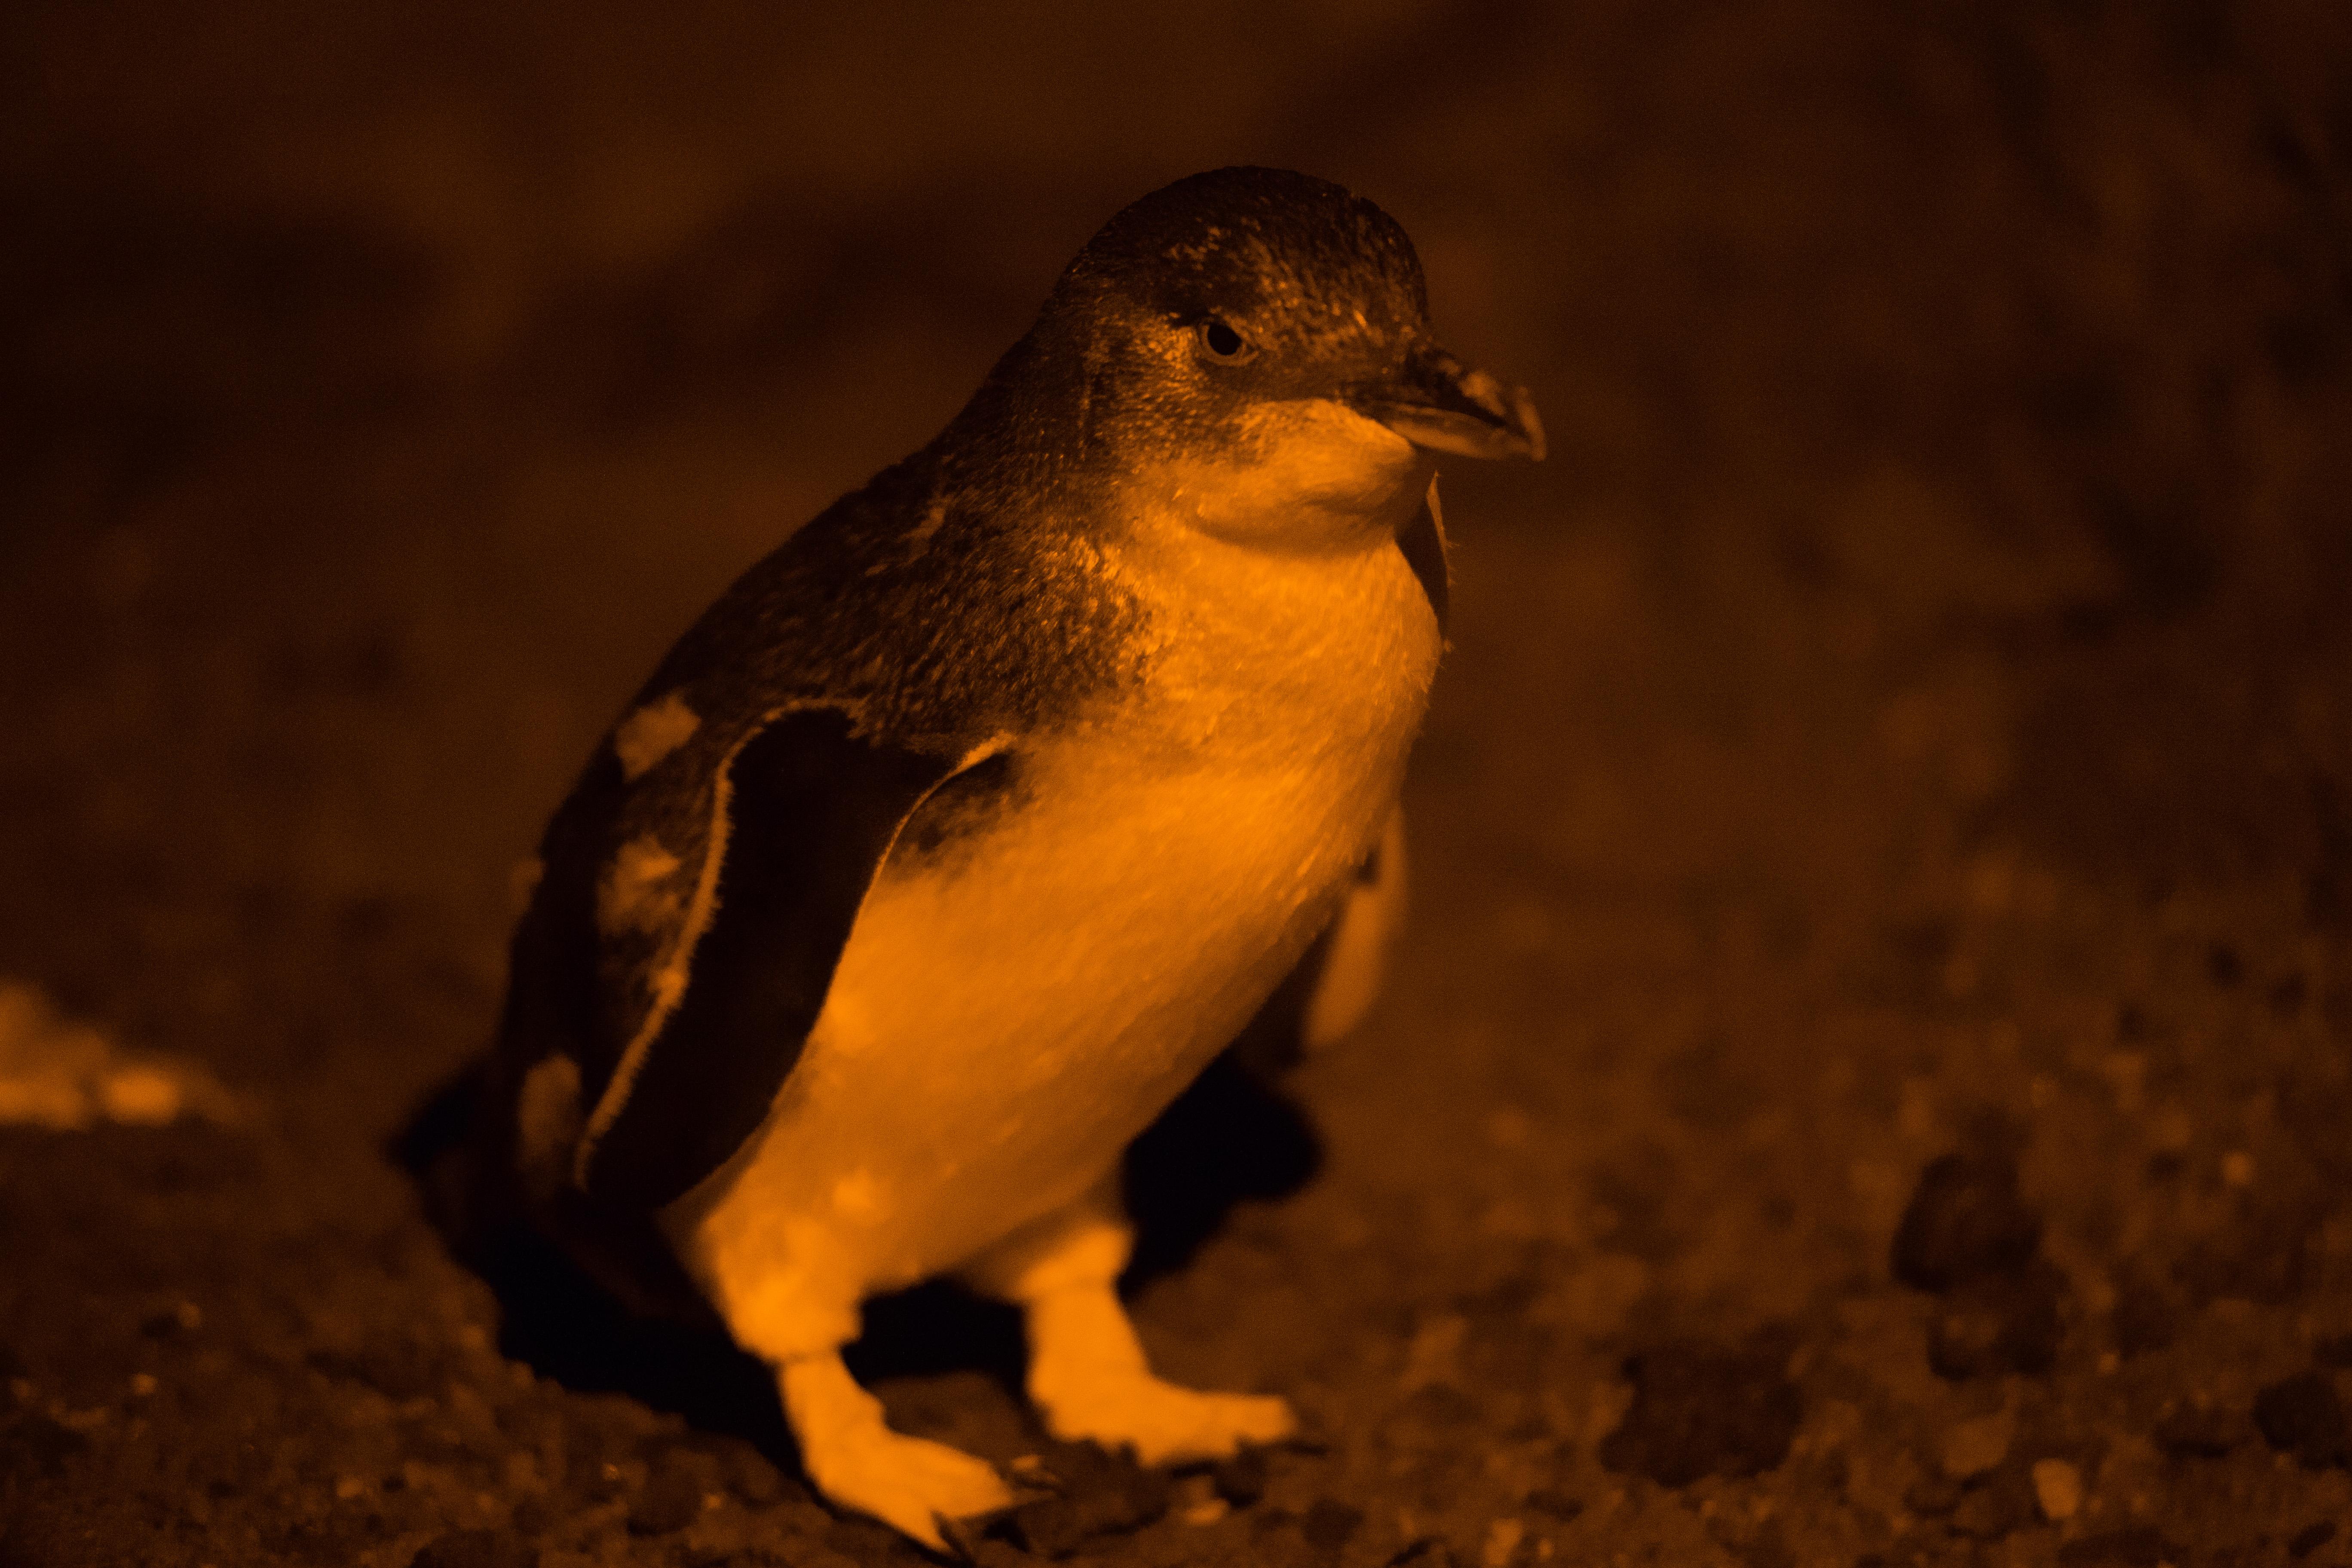 Manchots-St-Kilda-fairy-penguins-2